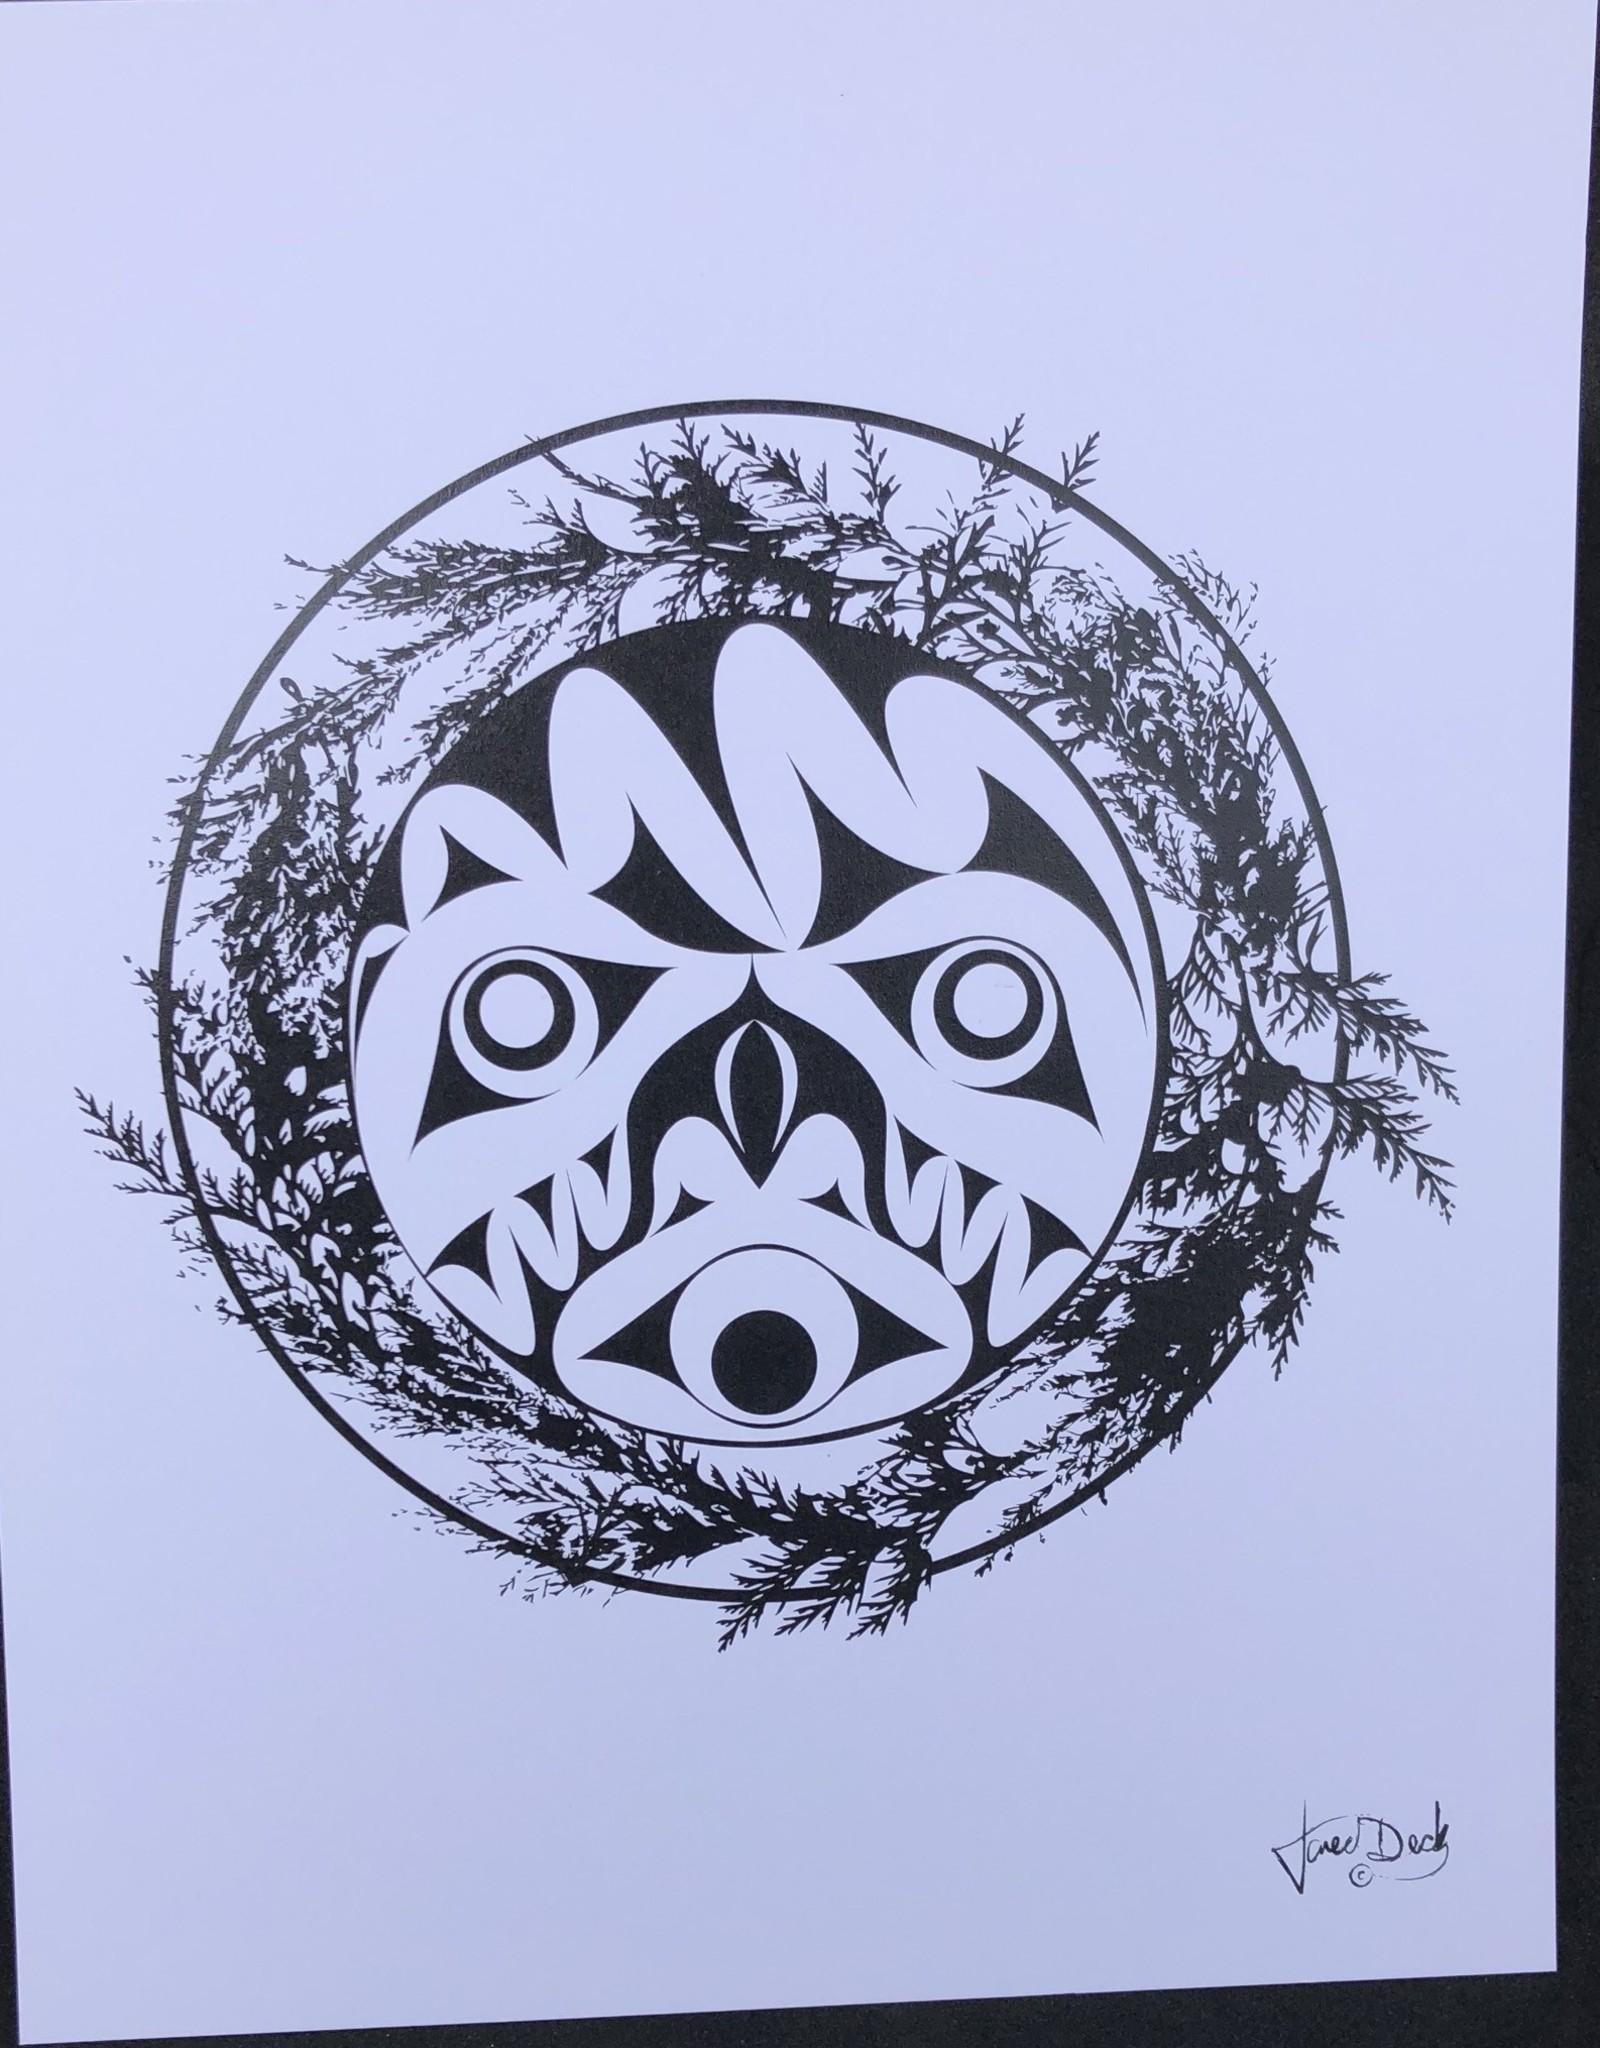 8 x 10 NC Prints